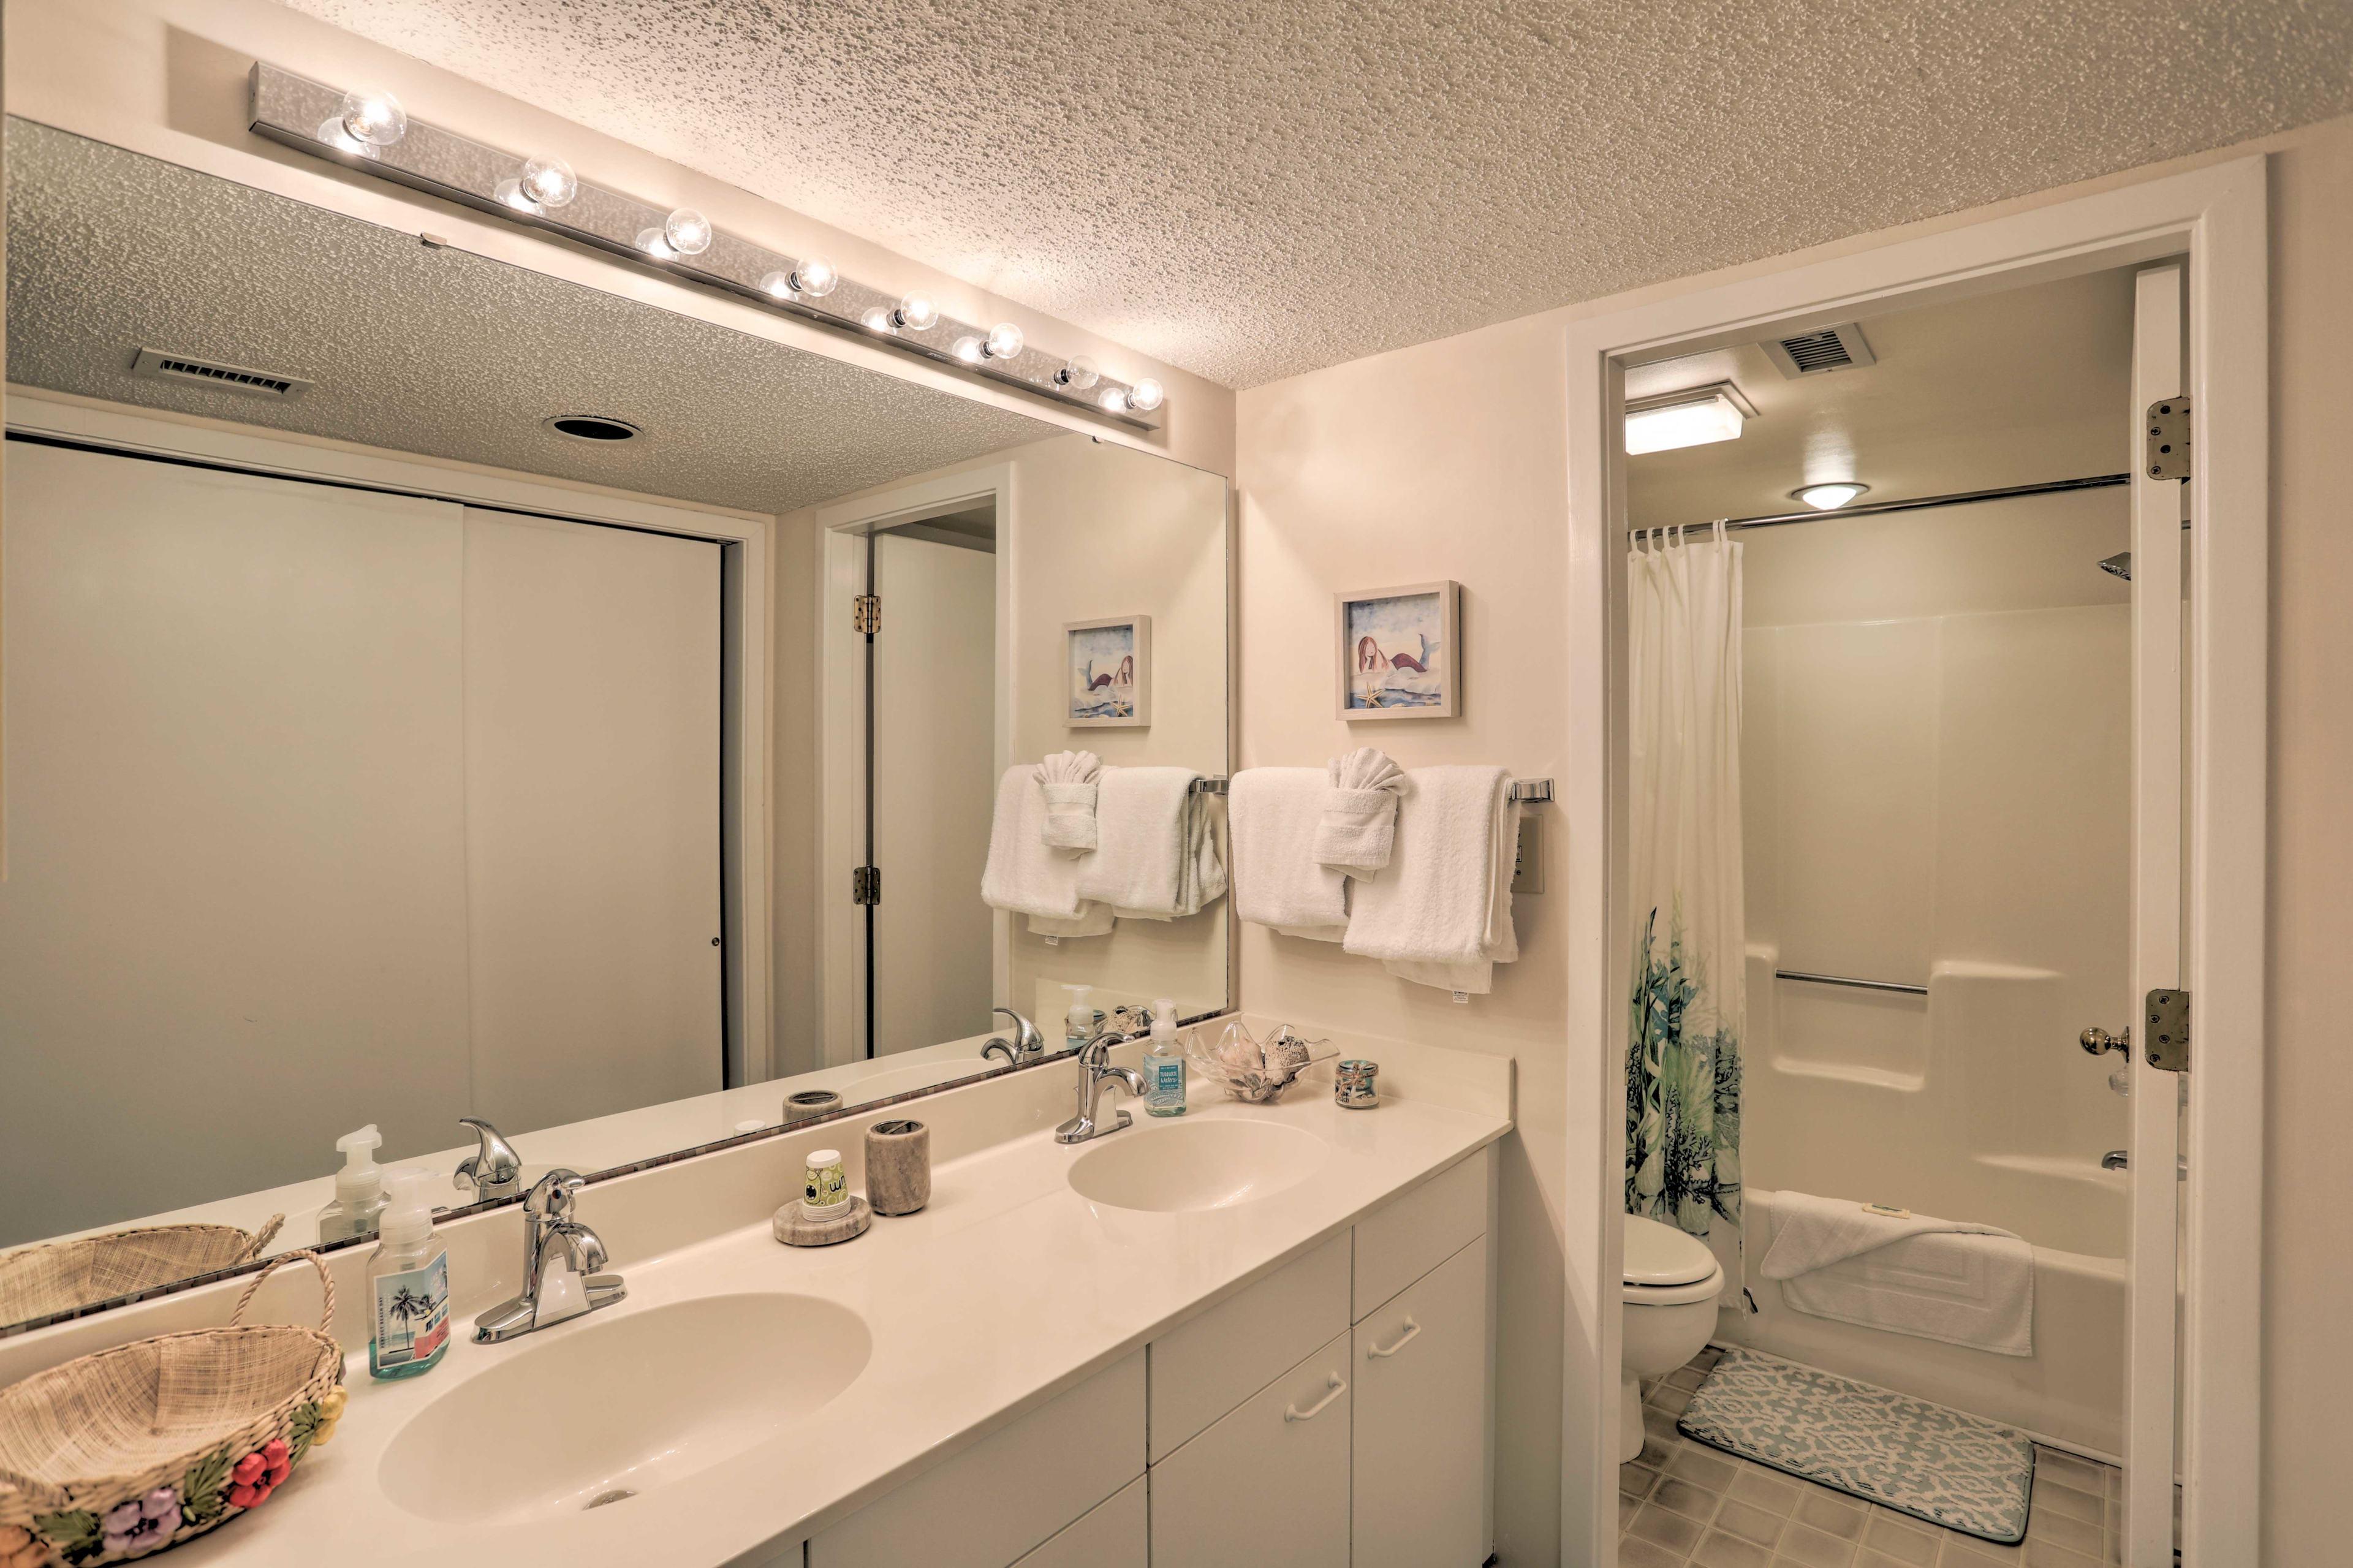 Bathroom | Linens/Towels Provided